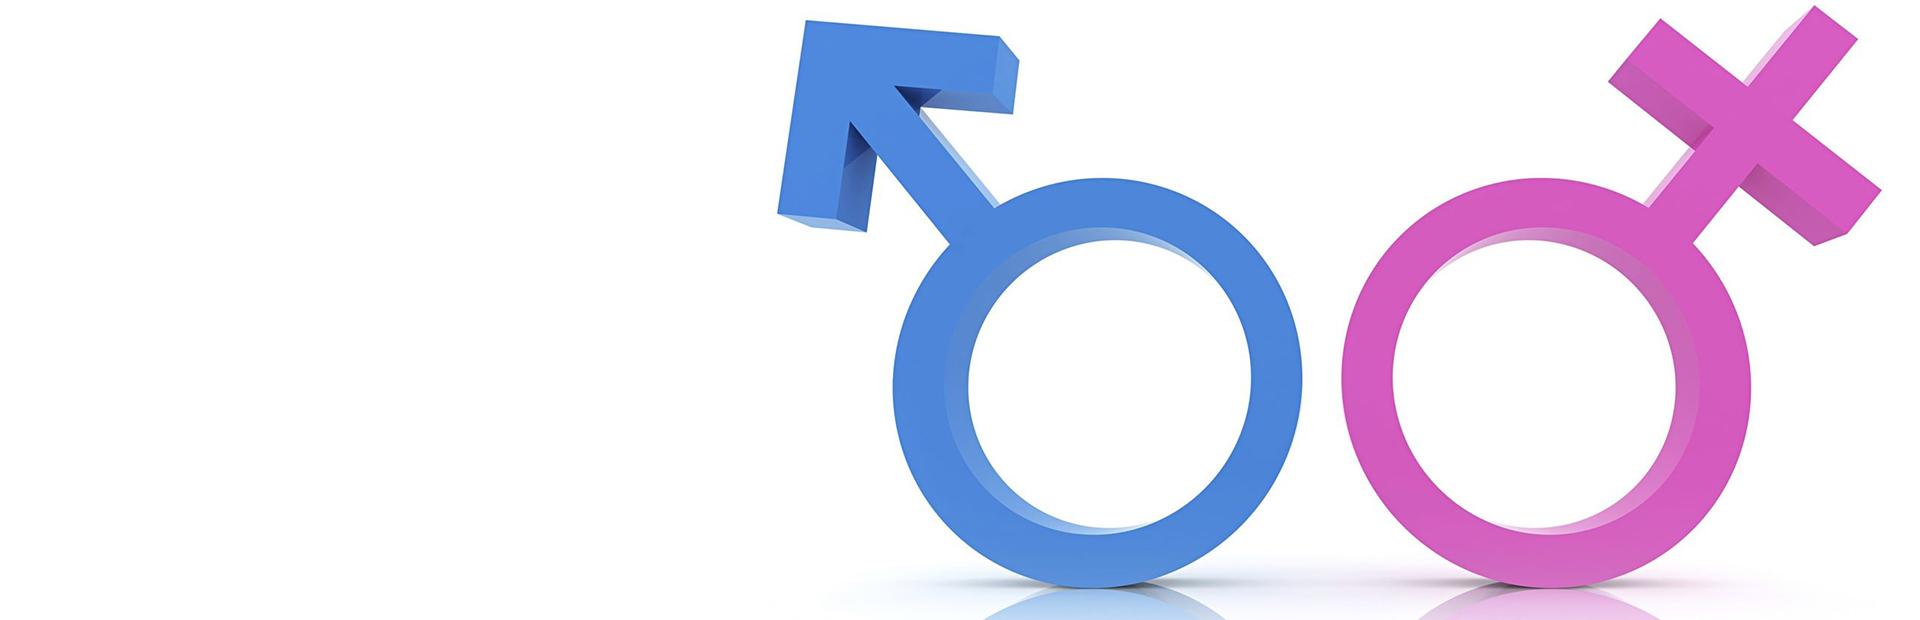 Нестероидные регуляторные факторы половых желез